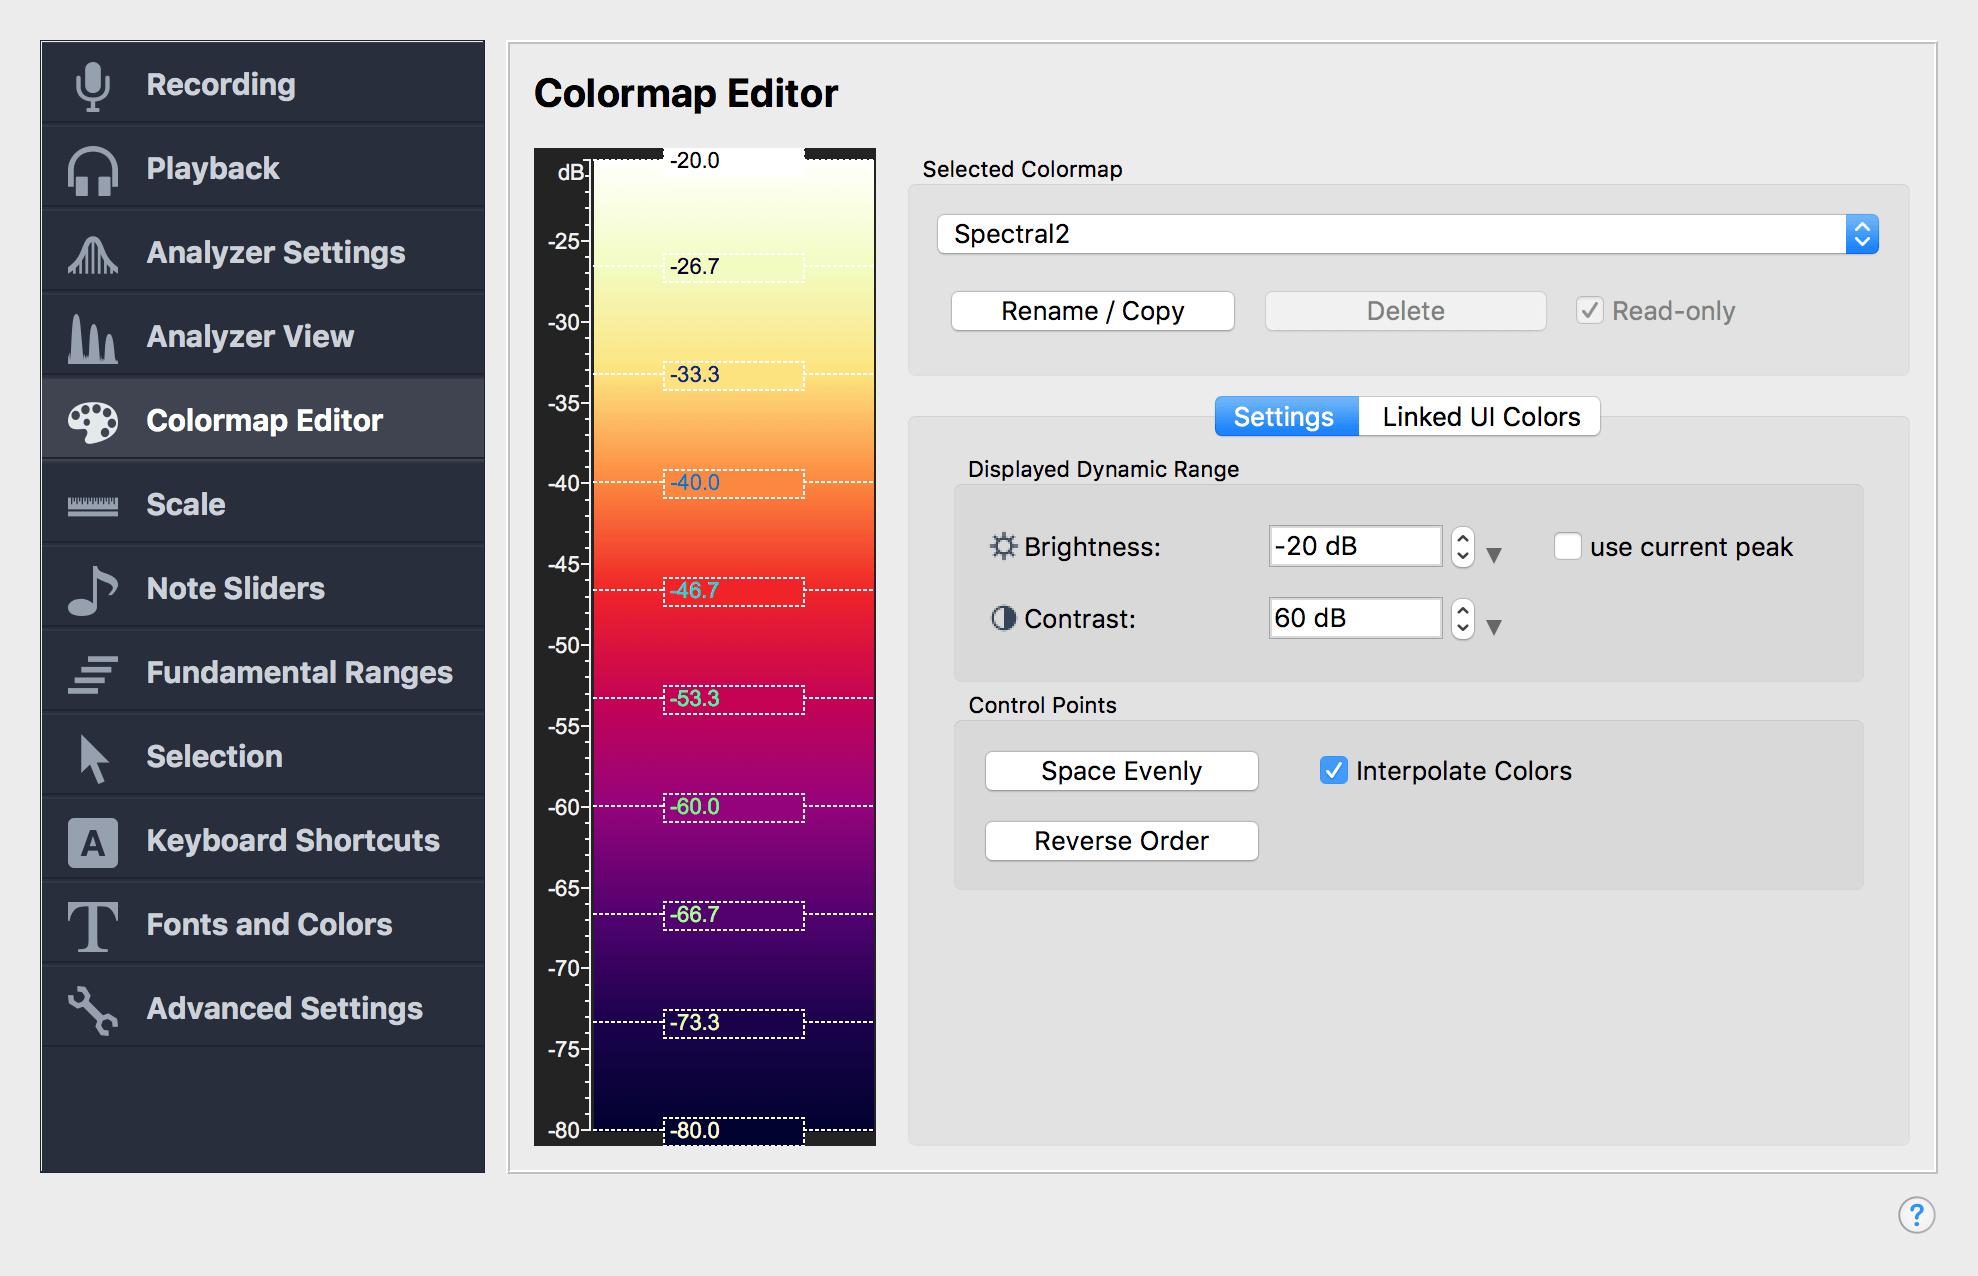 Colormap Editor